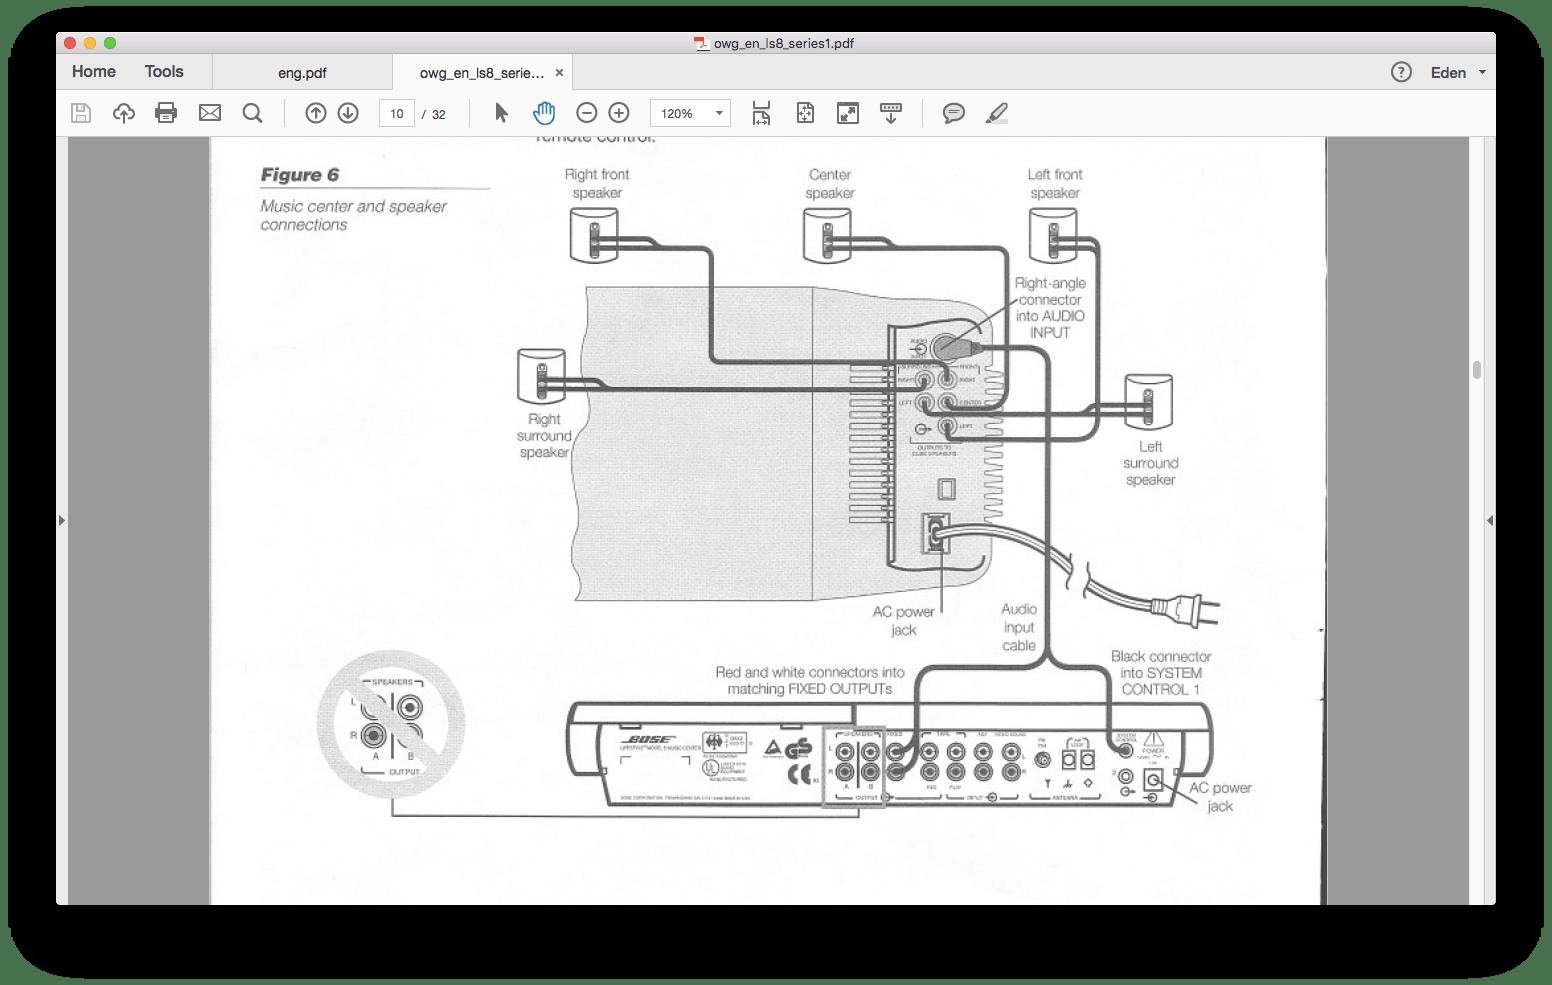 Bose T20 Wiring Diagram - Diagram Design Sources electrical-solid -  electrical-solid.nius-icbosa.itnius-icbosa.it